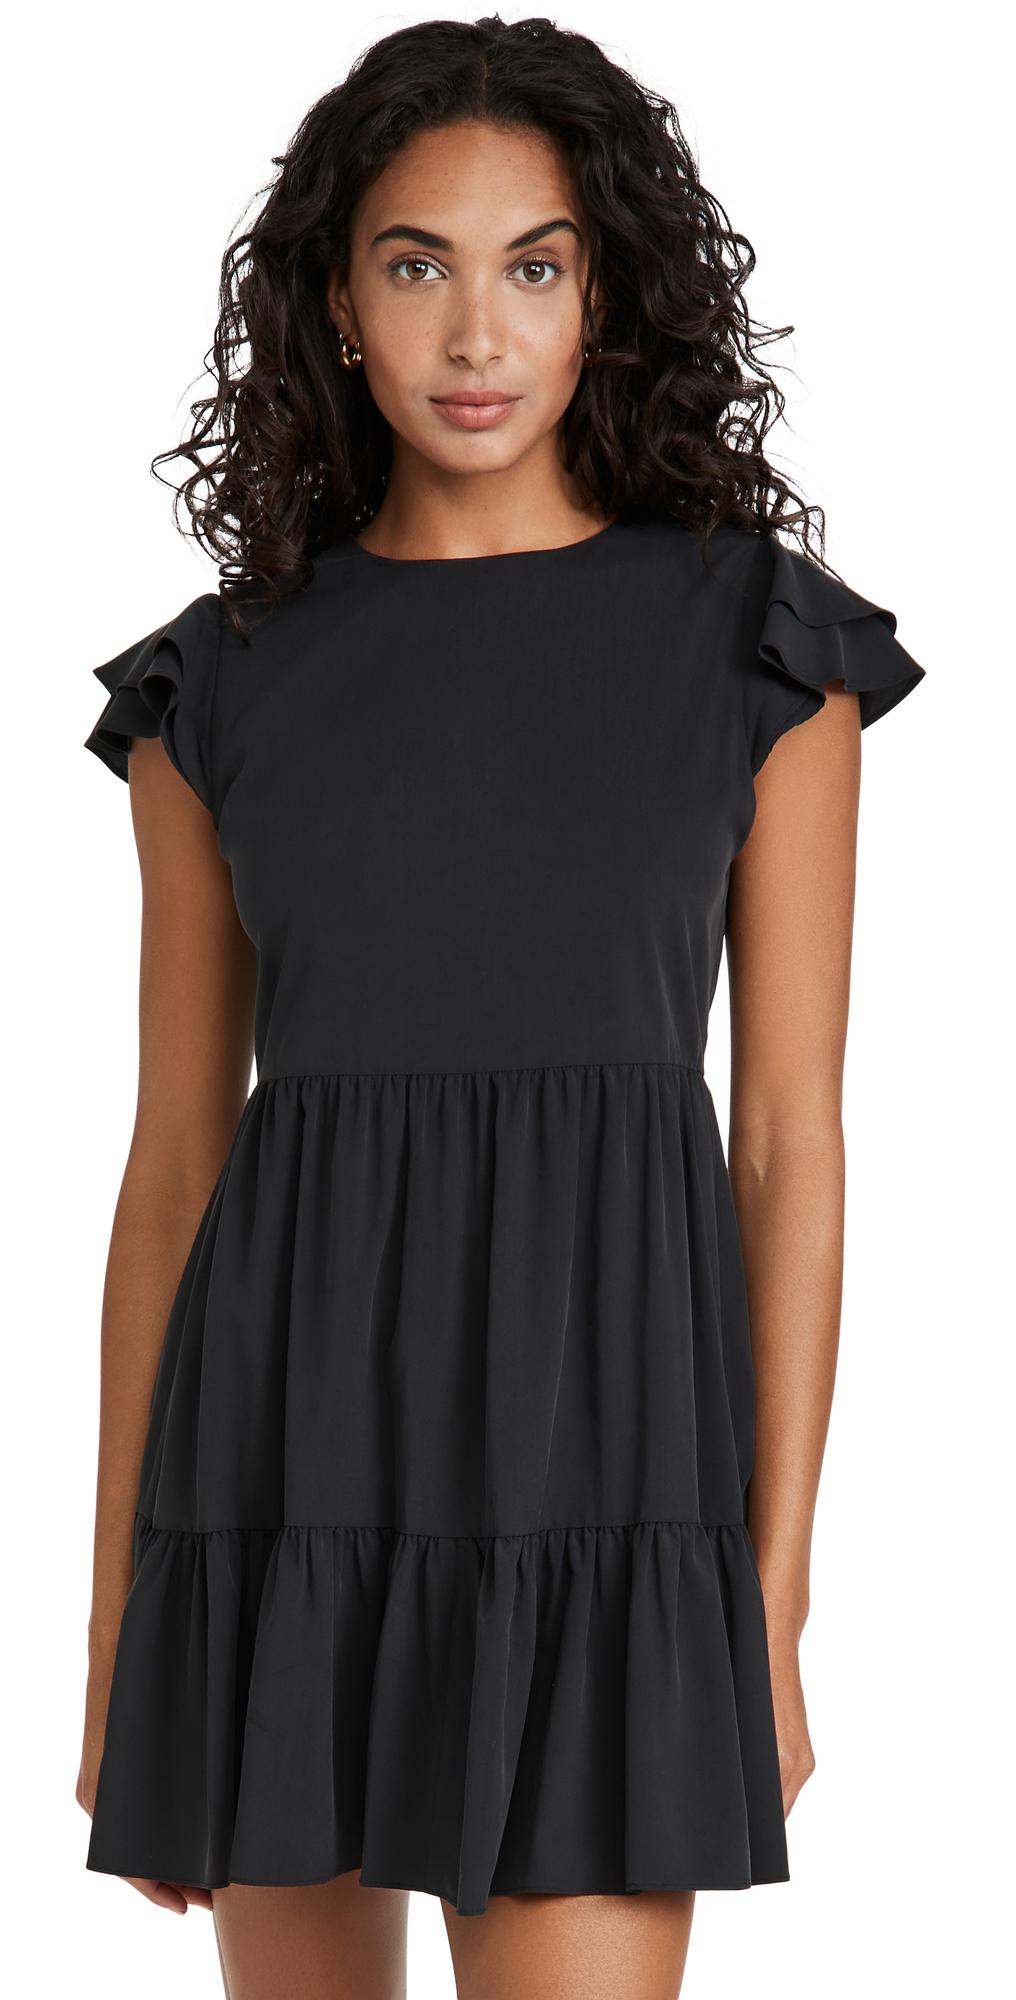 alice + olivia Demi Babydoll Dress